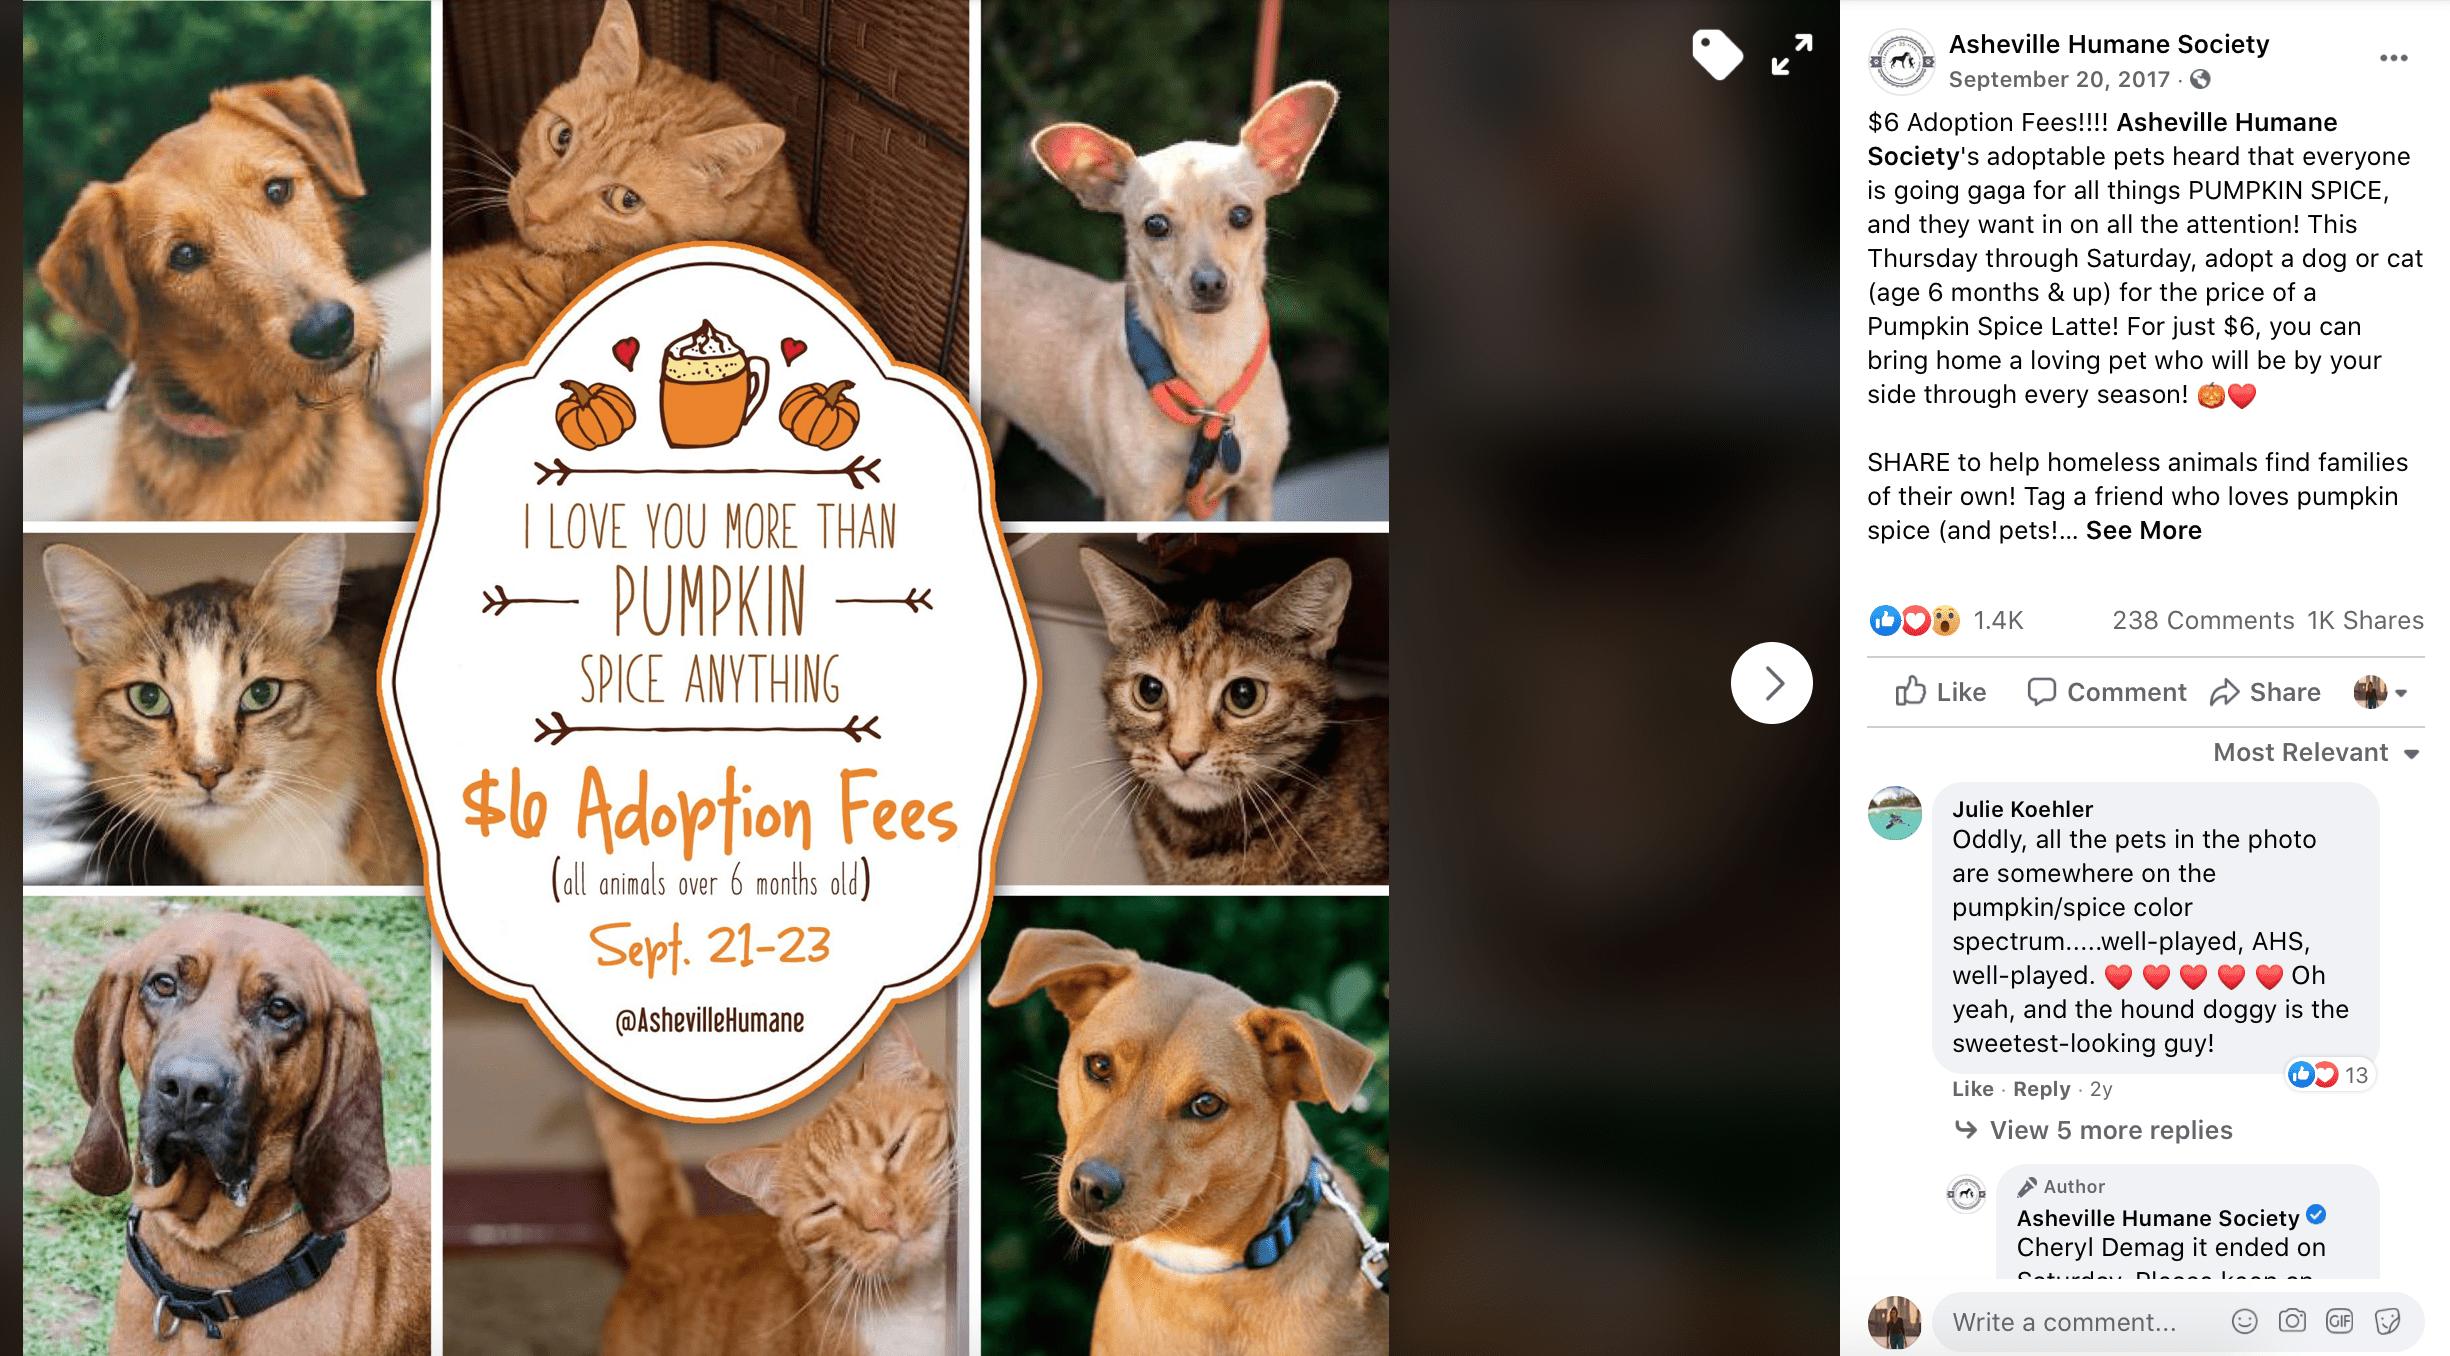 October Social Media Calendar adopt a shelter dog day